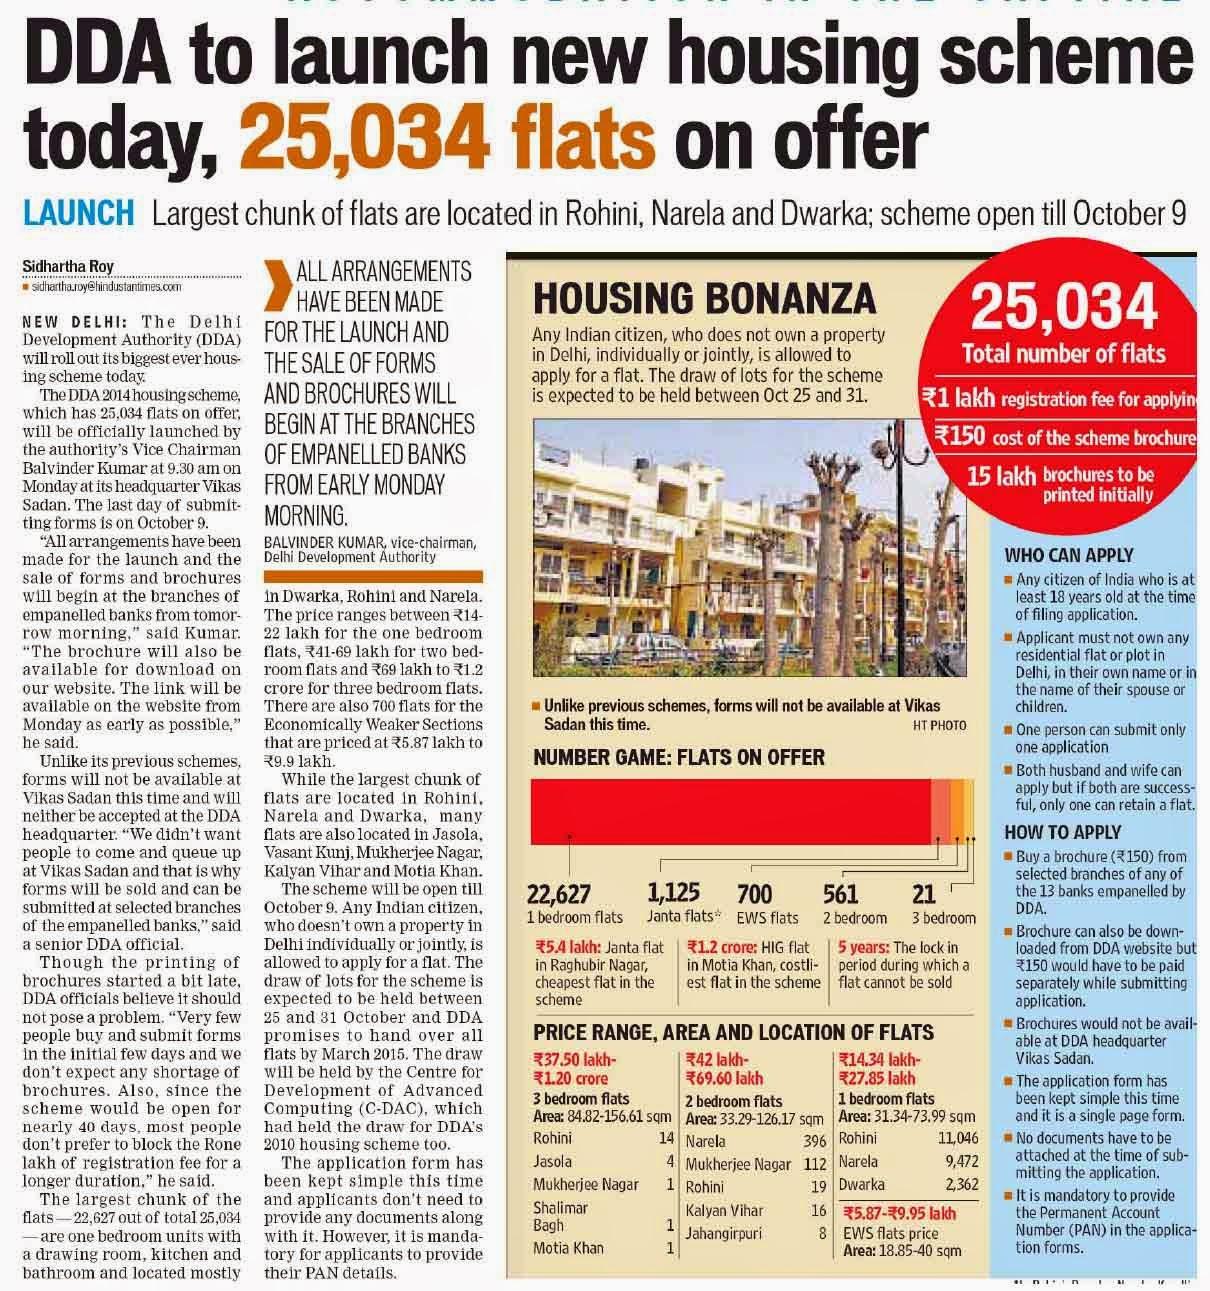 dda flats 2014 scheme bank list